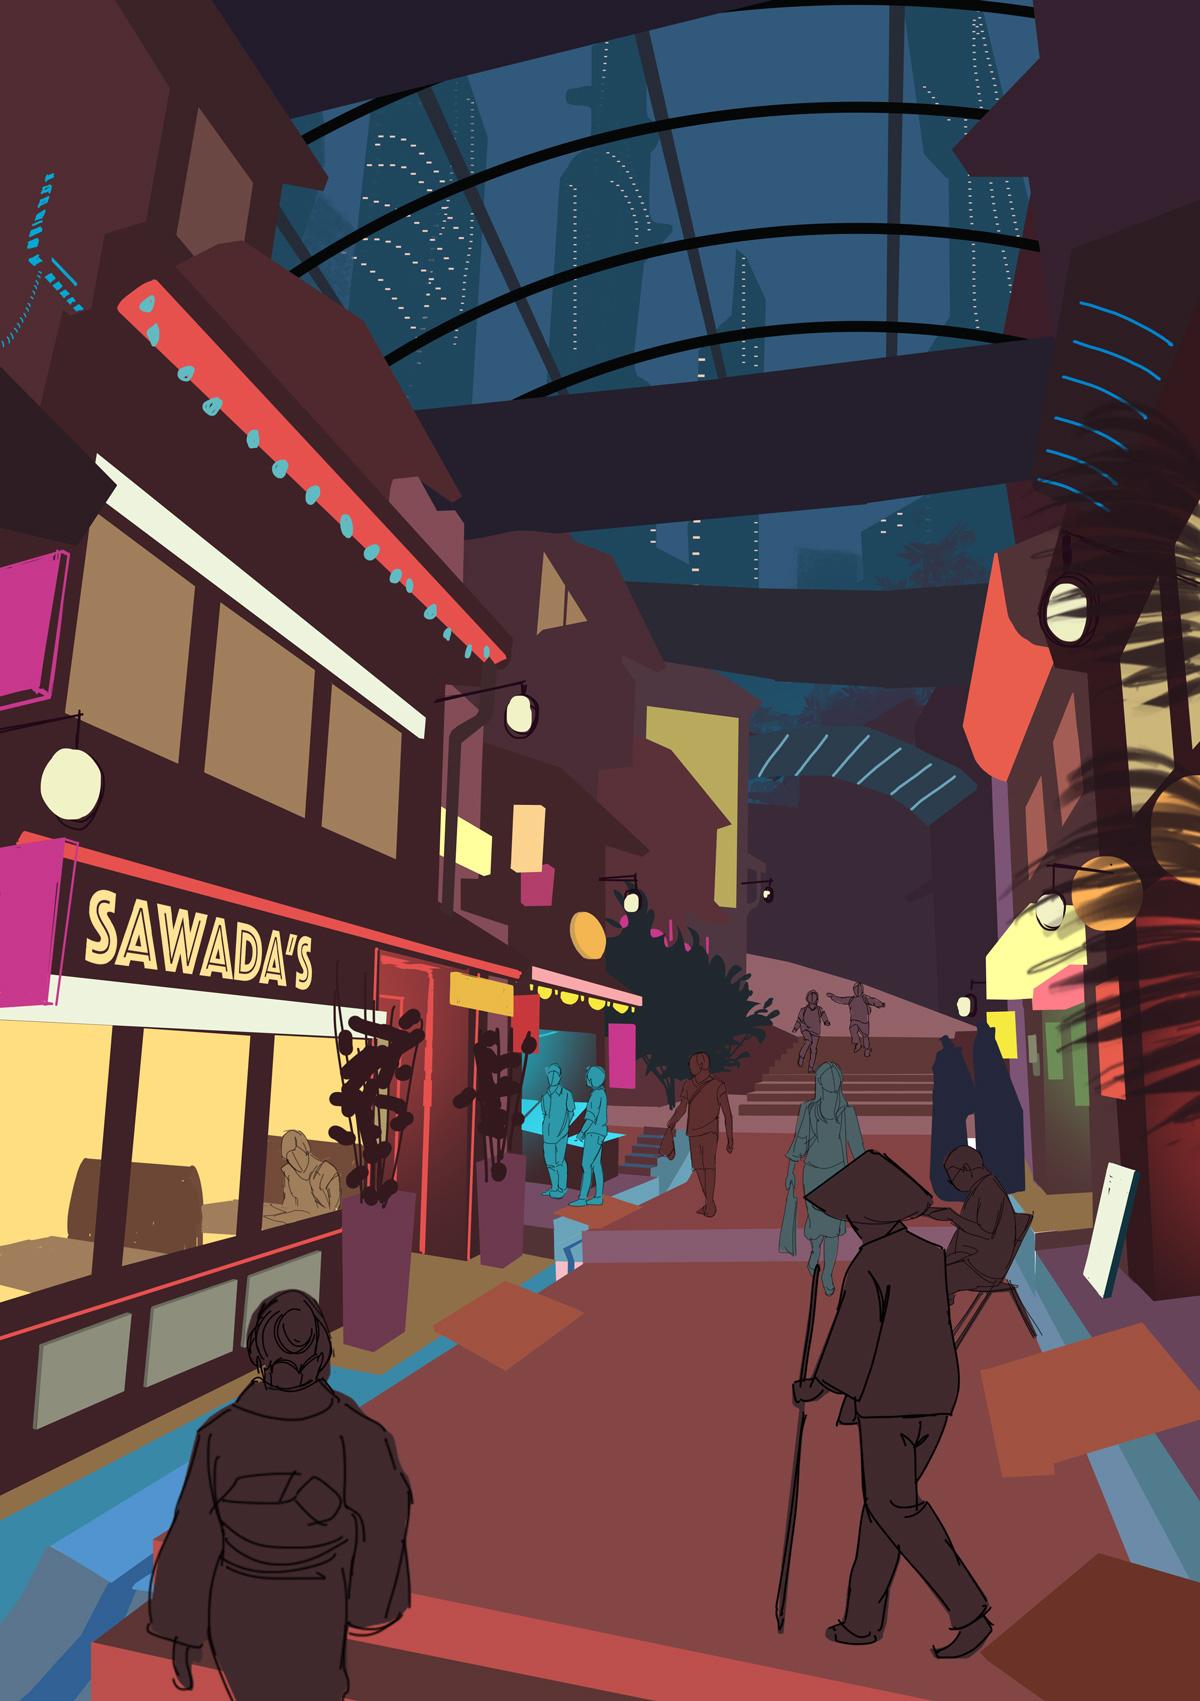 Illustration de Sandrine Pilloud | Japanese Market | Livre Kanako Sawada écrit par Lionel Tardy